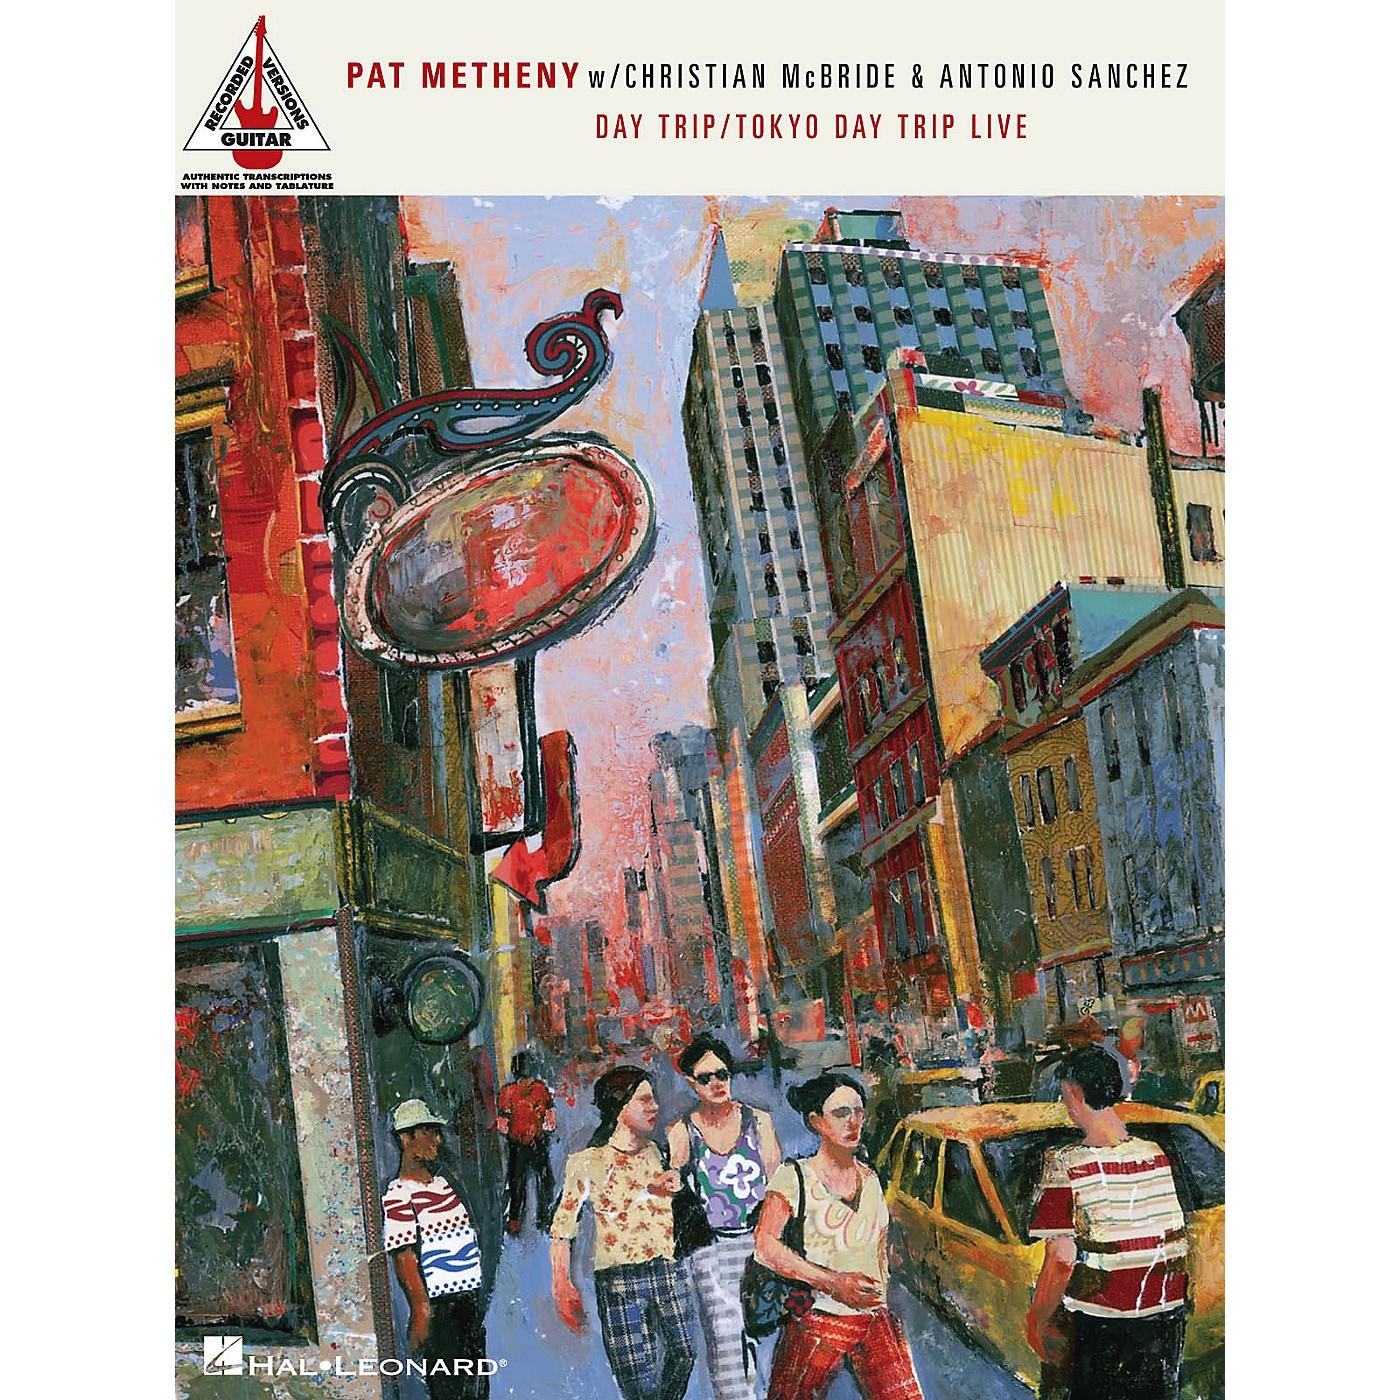 Hal Leonard Pat Metheny with Christian McBride & Antonion Sanchez - Day Trip/Tokyo Day Trip Live Guitar Tab Book thumbnail